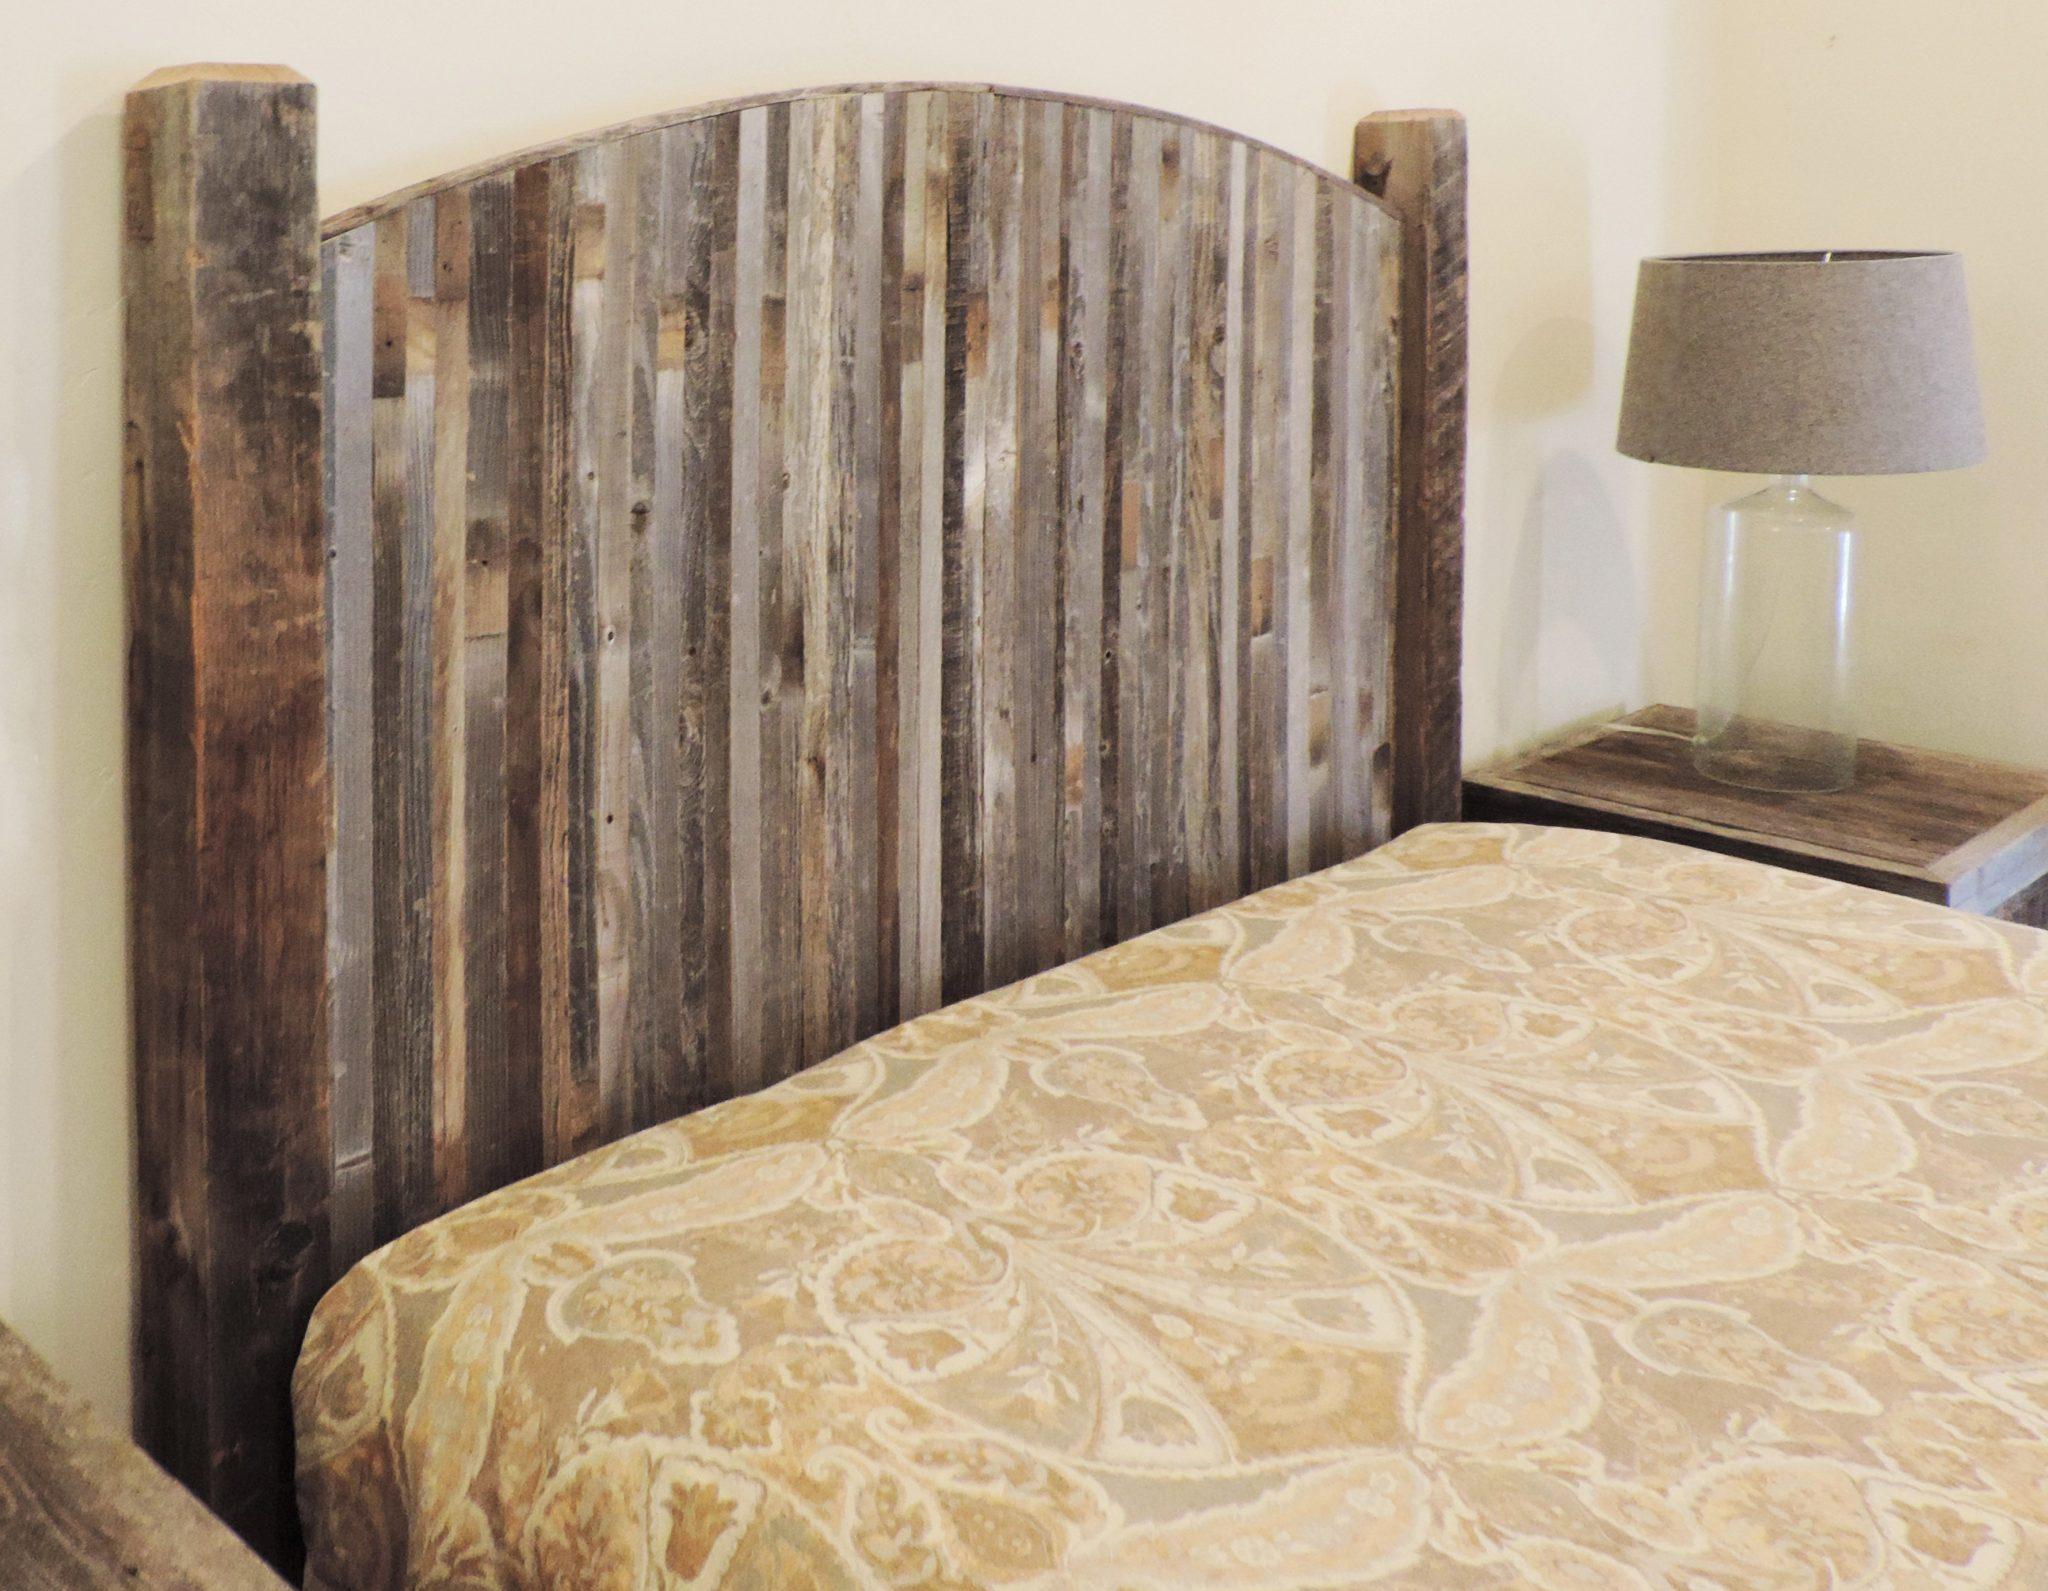 Farmhouse Style Arched Queen Bed Barn Wood Headboard W Narrow Rustic Reclaimed Wood Slats Allbarnwood